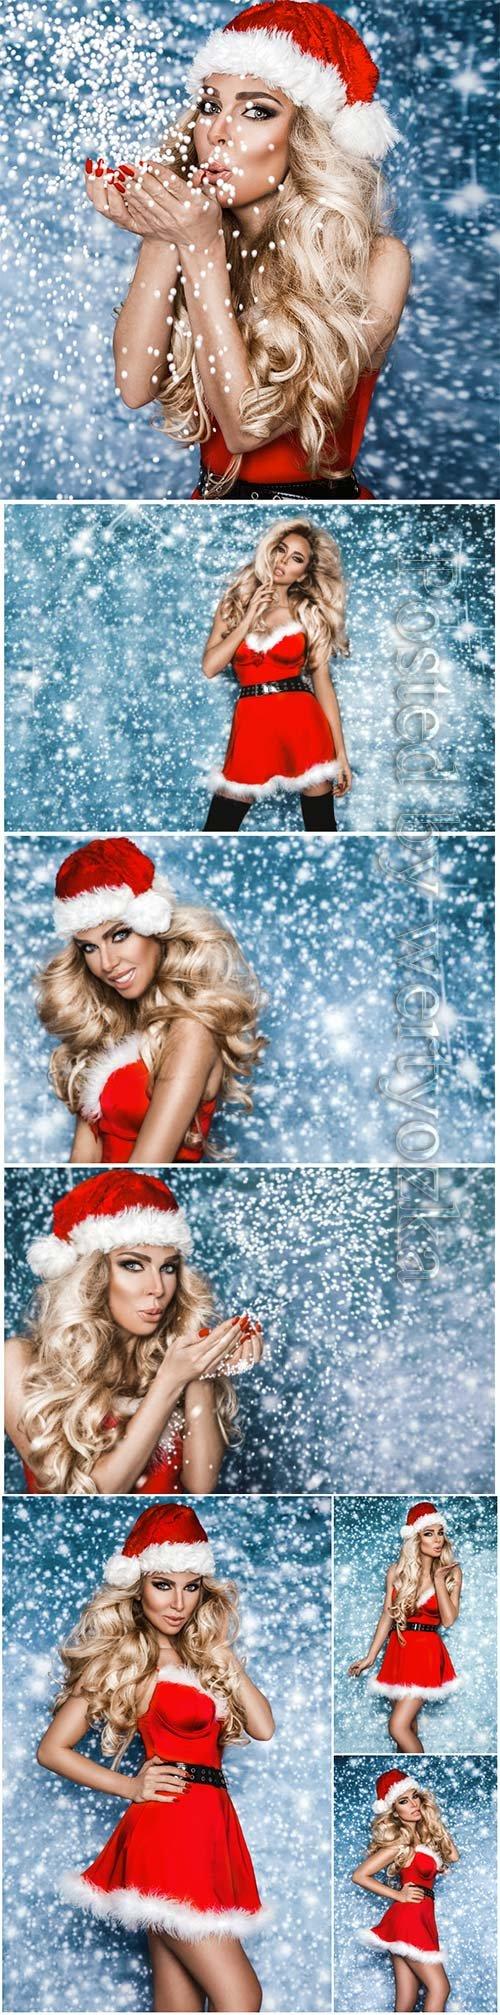 Beauty Christmas fashion model girl